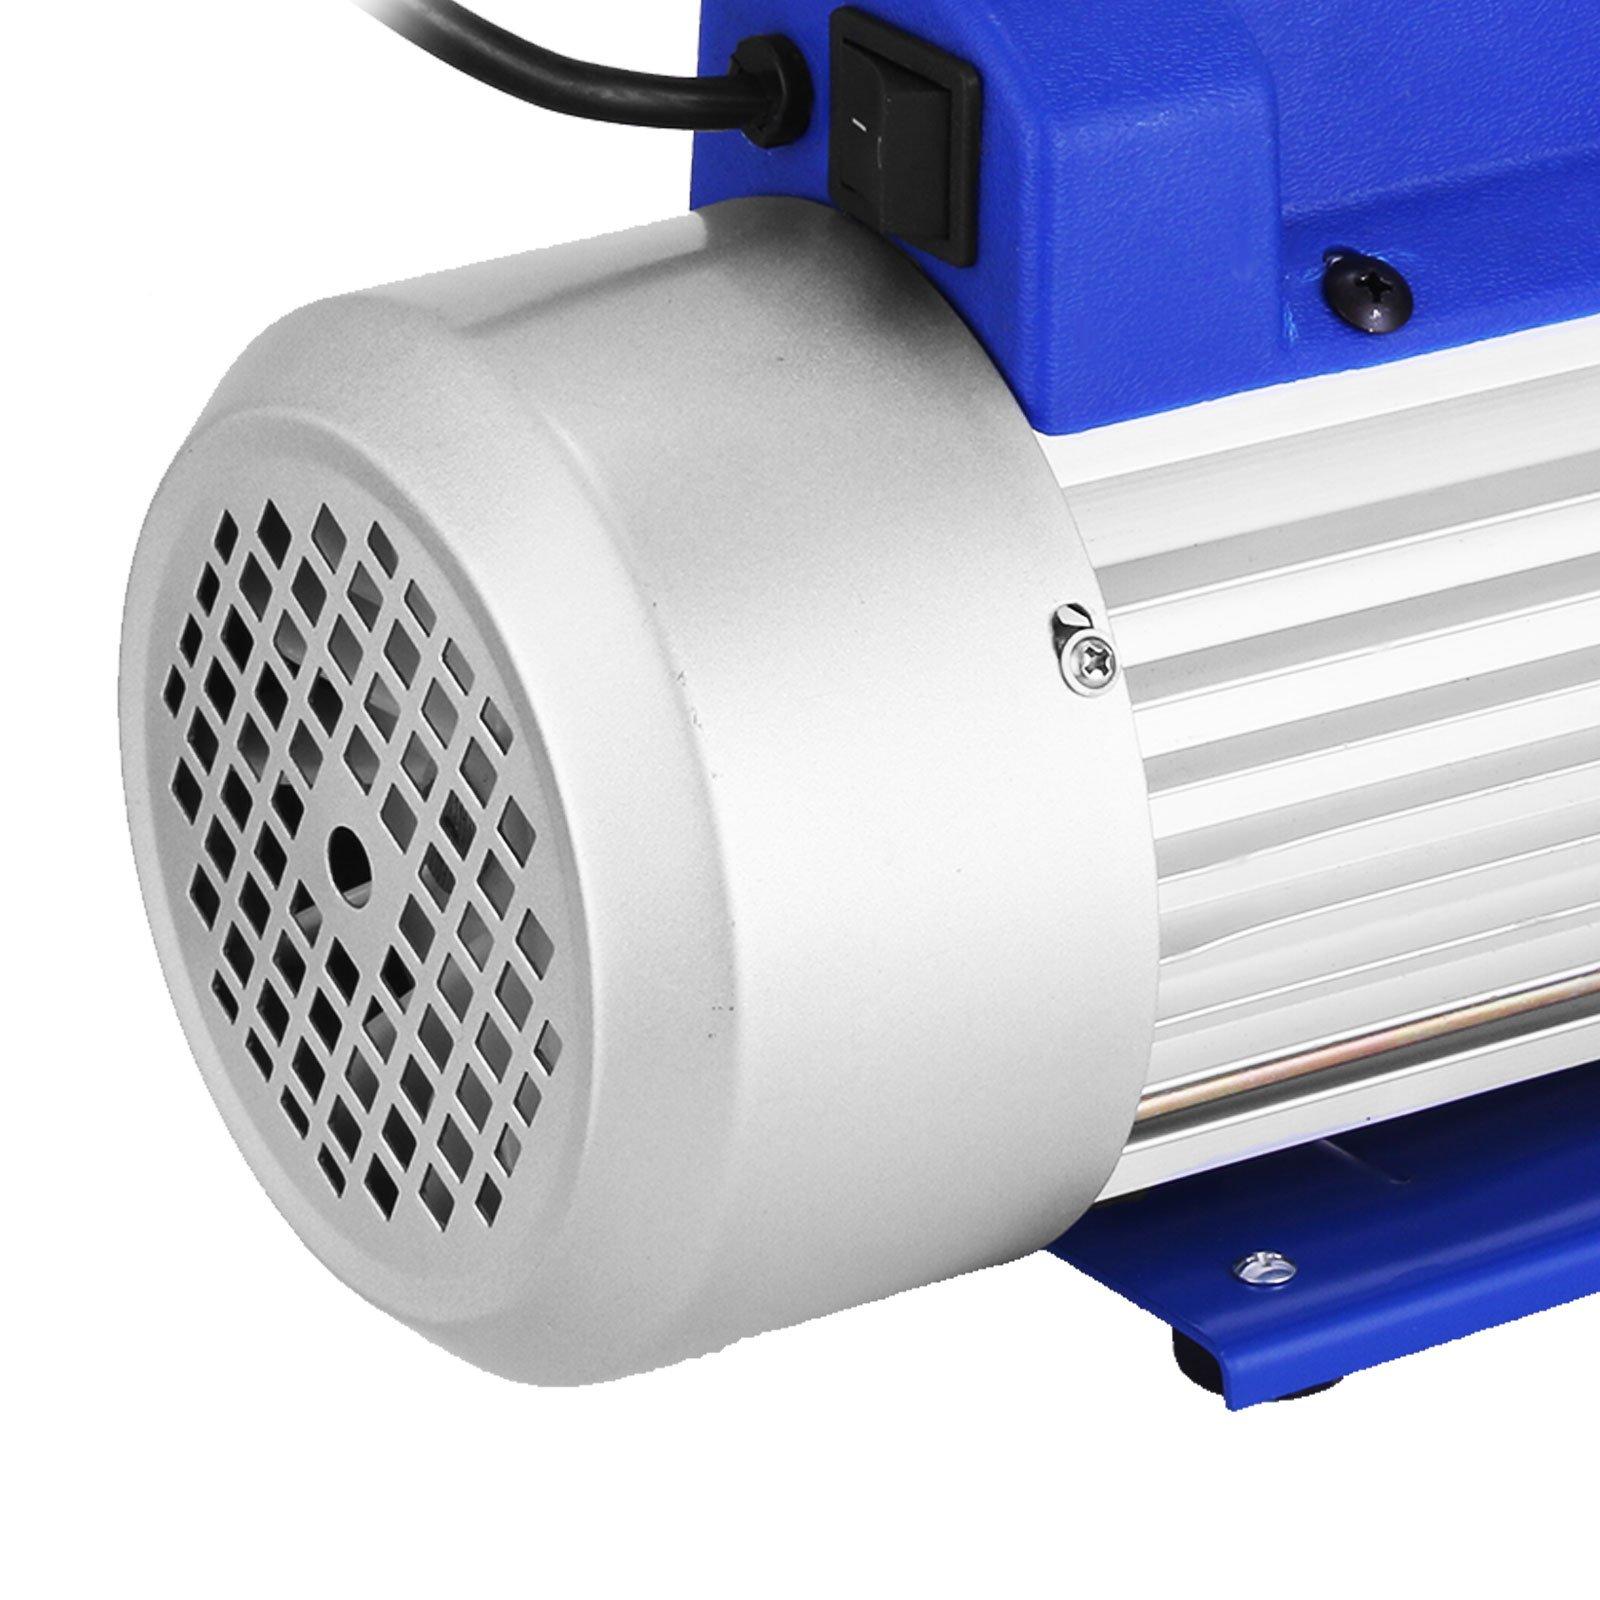 VEVOR Vacuum Pump 9CFM 1HP Two Stage HVAC Rotary Vane Vacuum Pump Wine Degassing Milking Medical Food Processing Air Conditioning Auto AC Refrigerant Vacuum Pump (2-Stage, 9CFM) by VEVOR (Image #7)